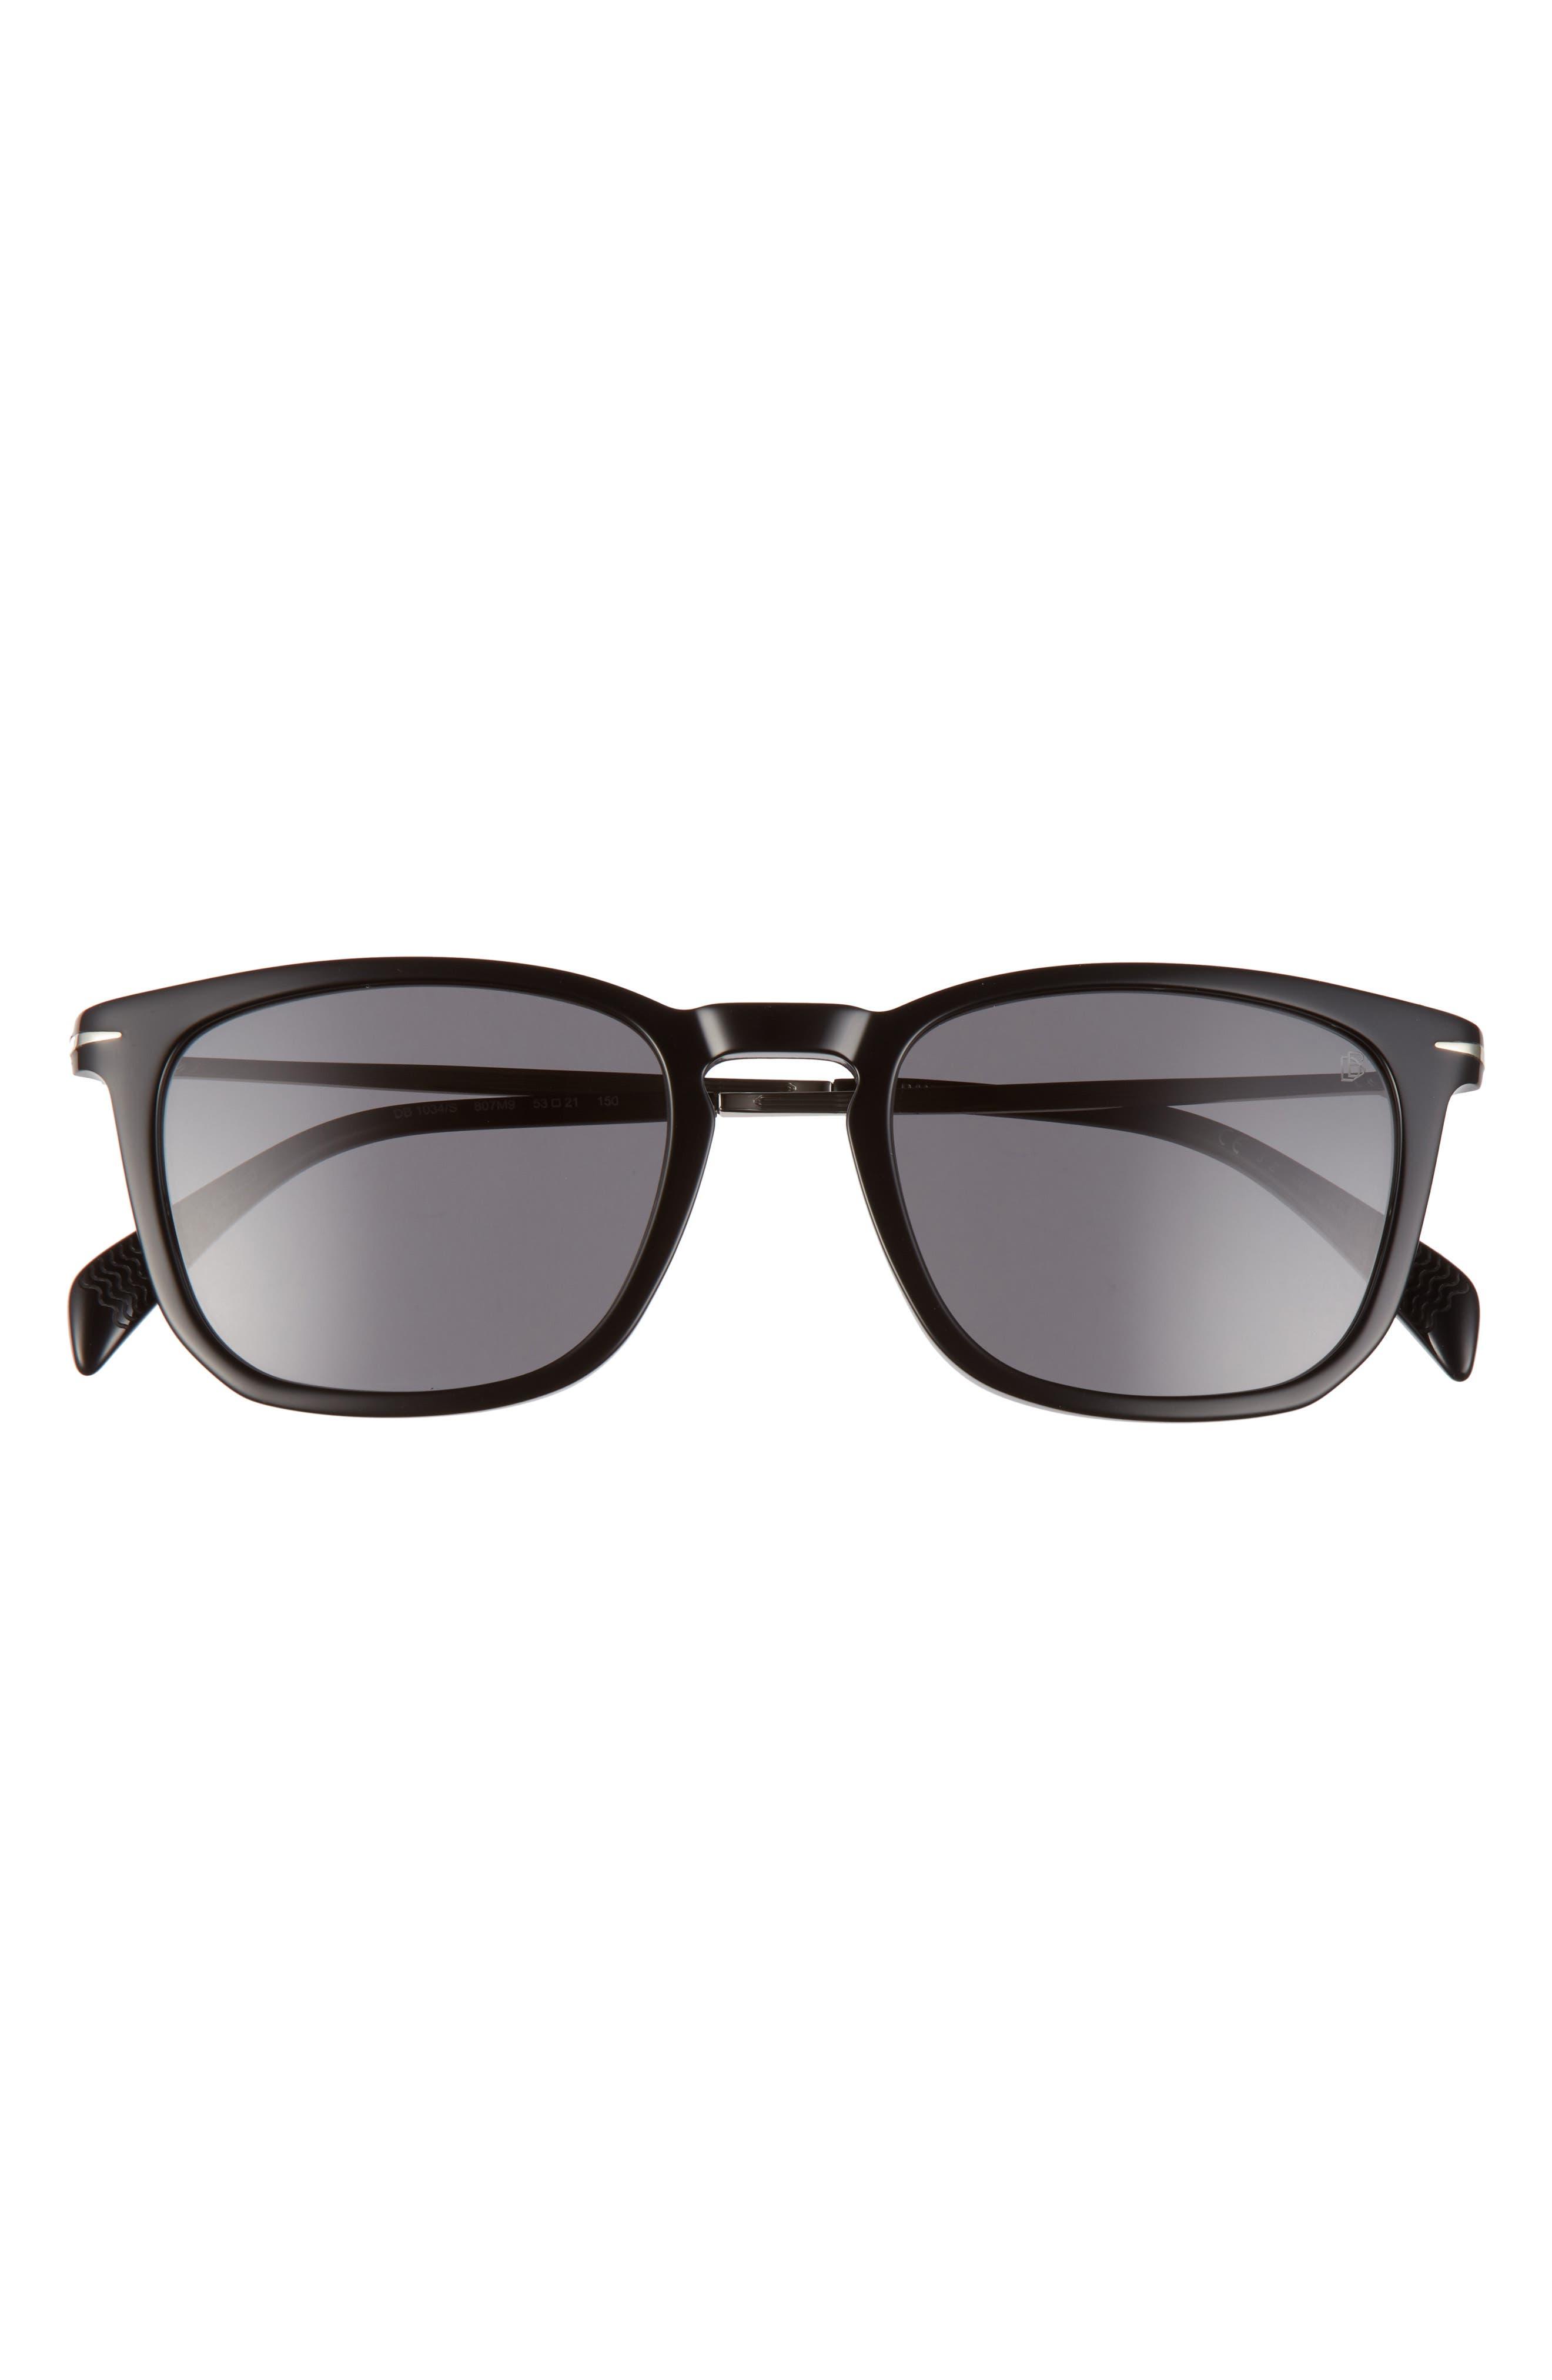 Men's Eyewear By David Beckham 53mm Polarized Rectangular Sunglasses